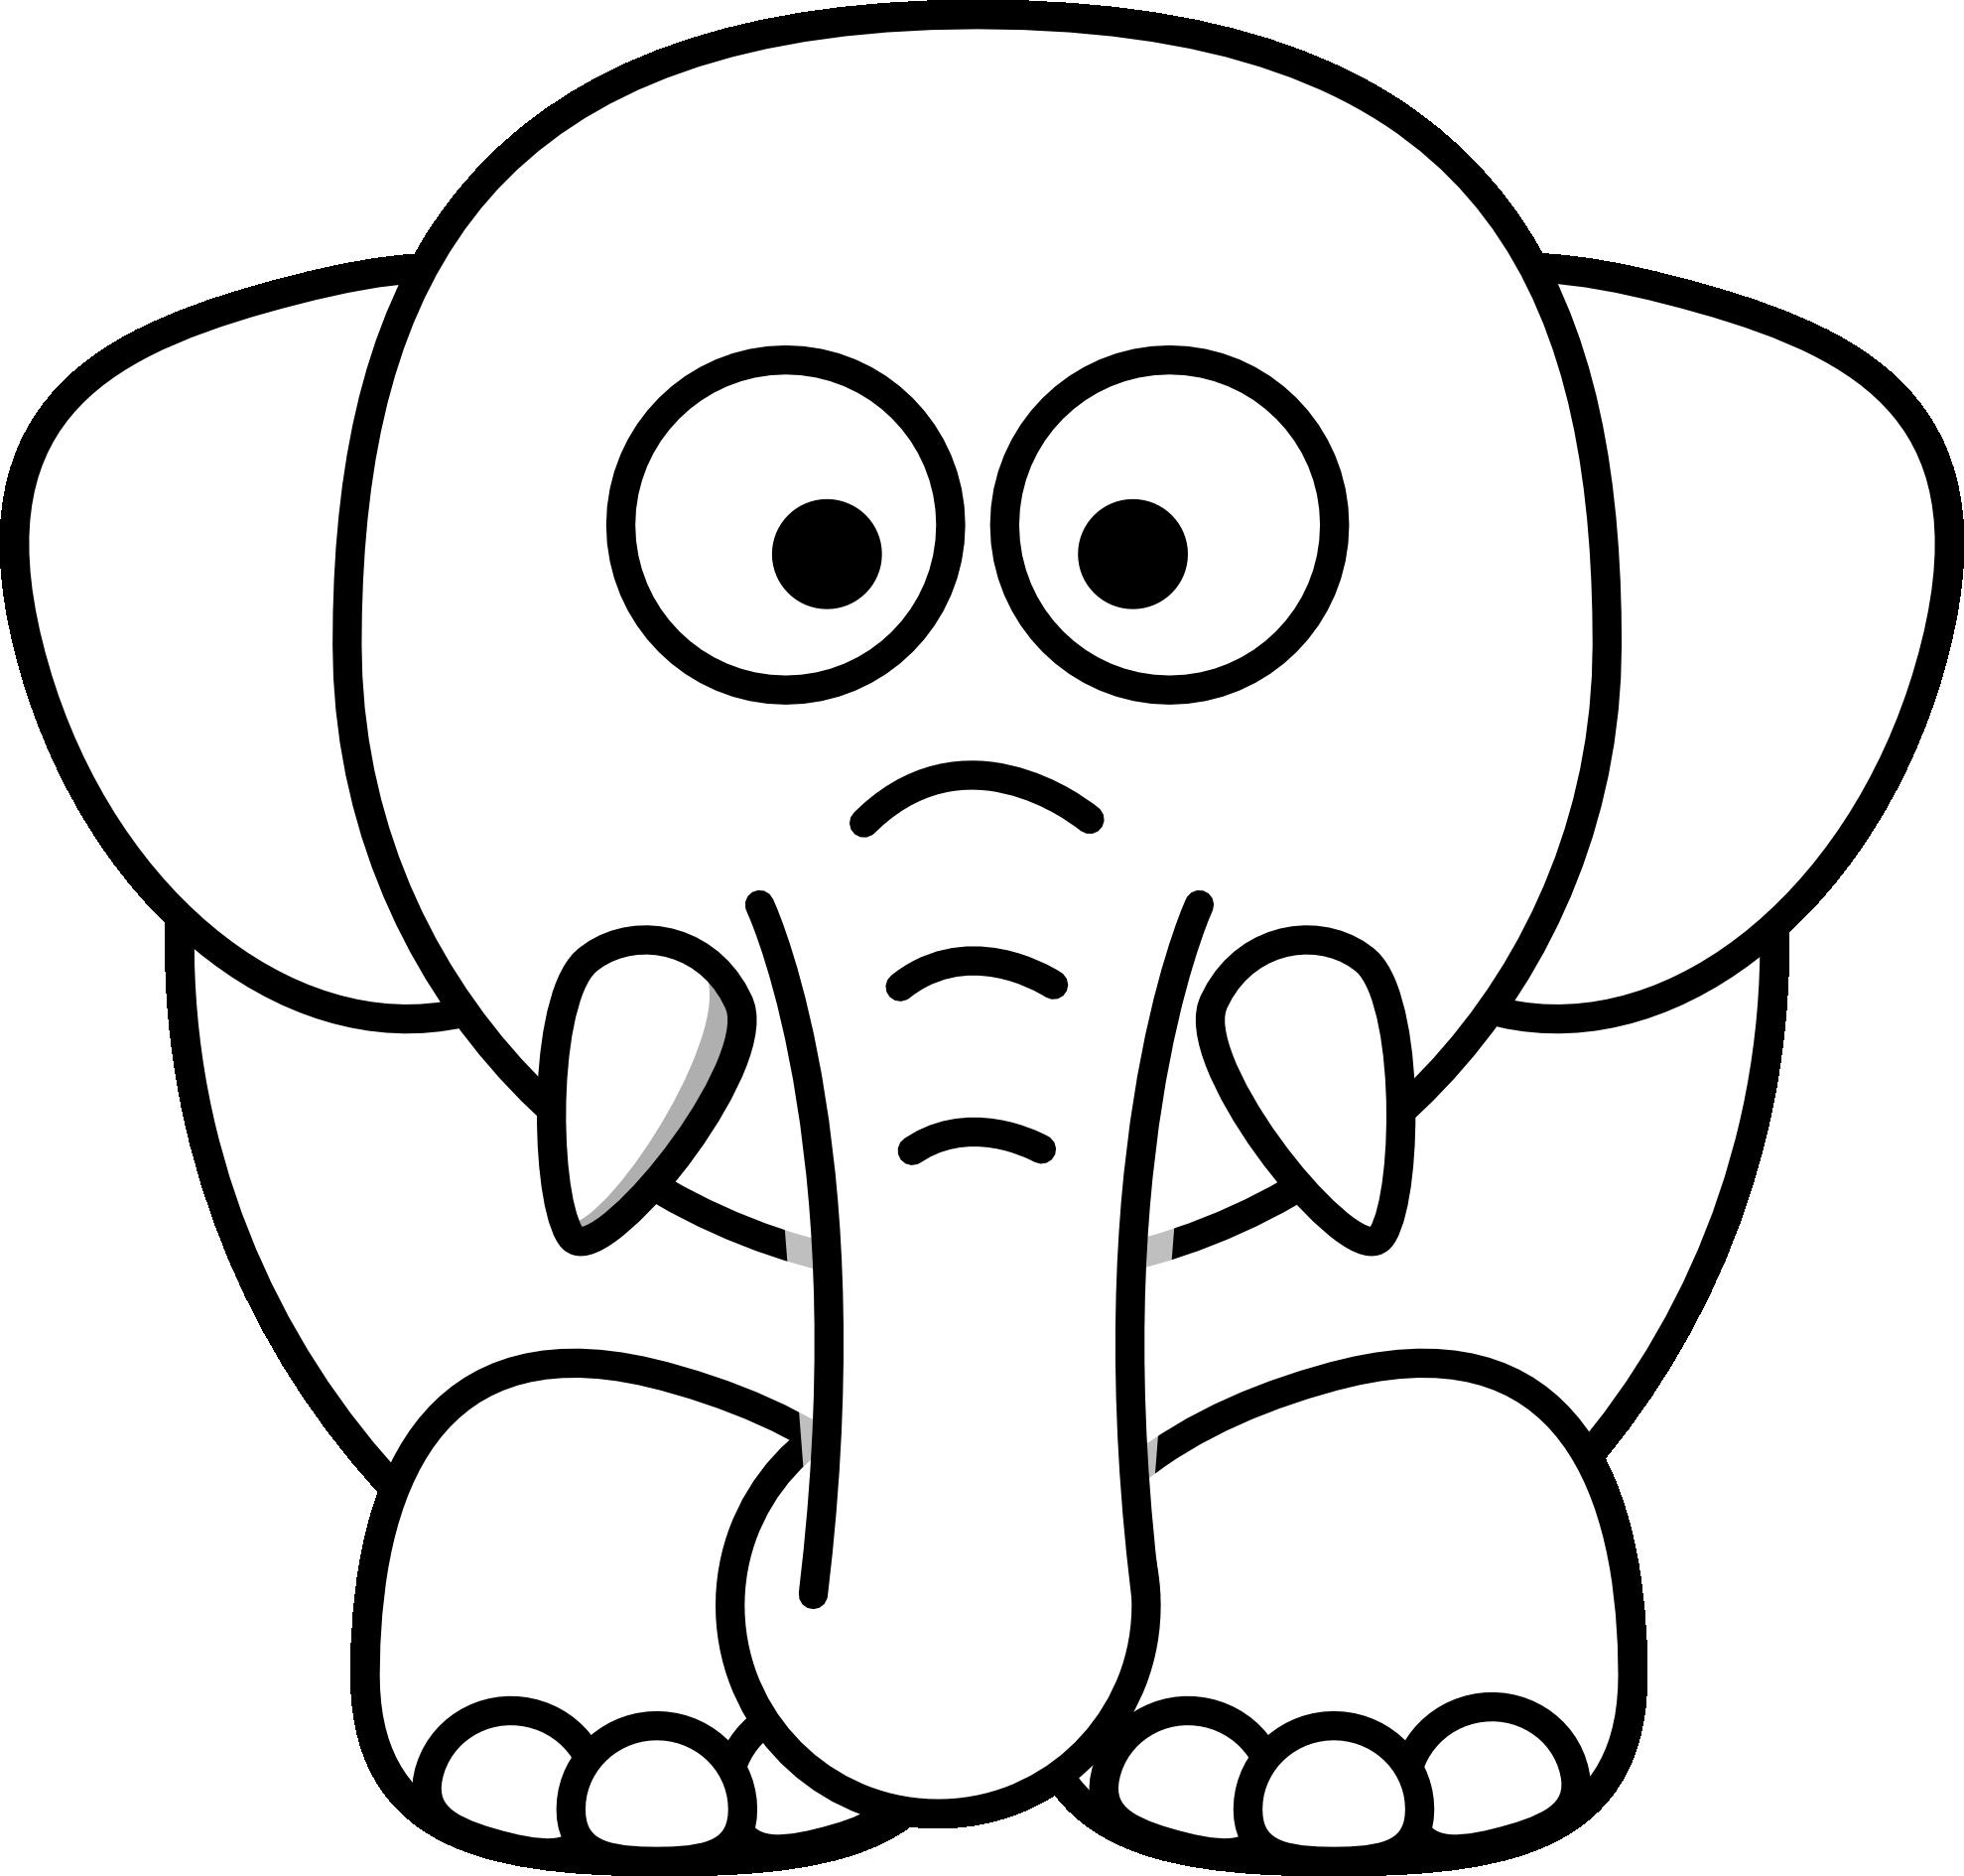 Cartoon elephant black and white